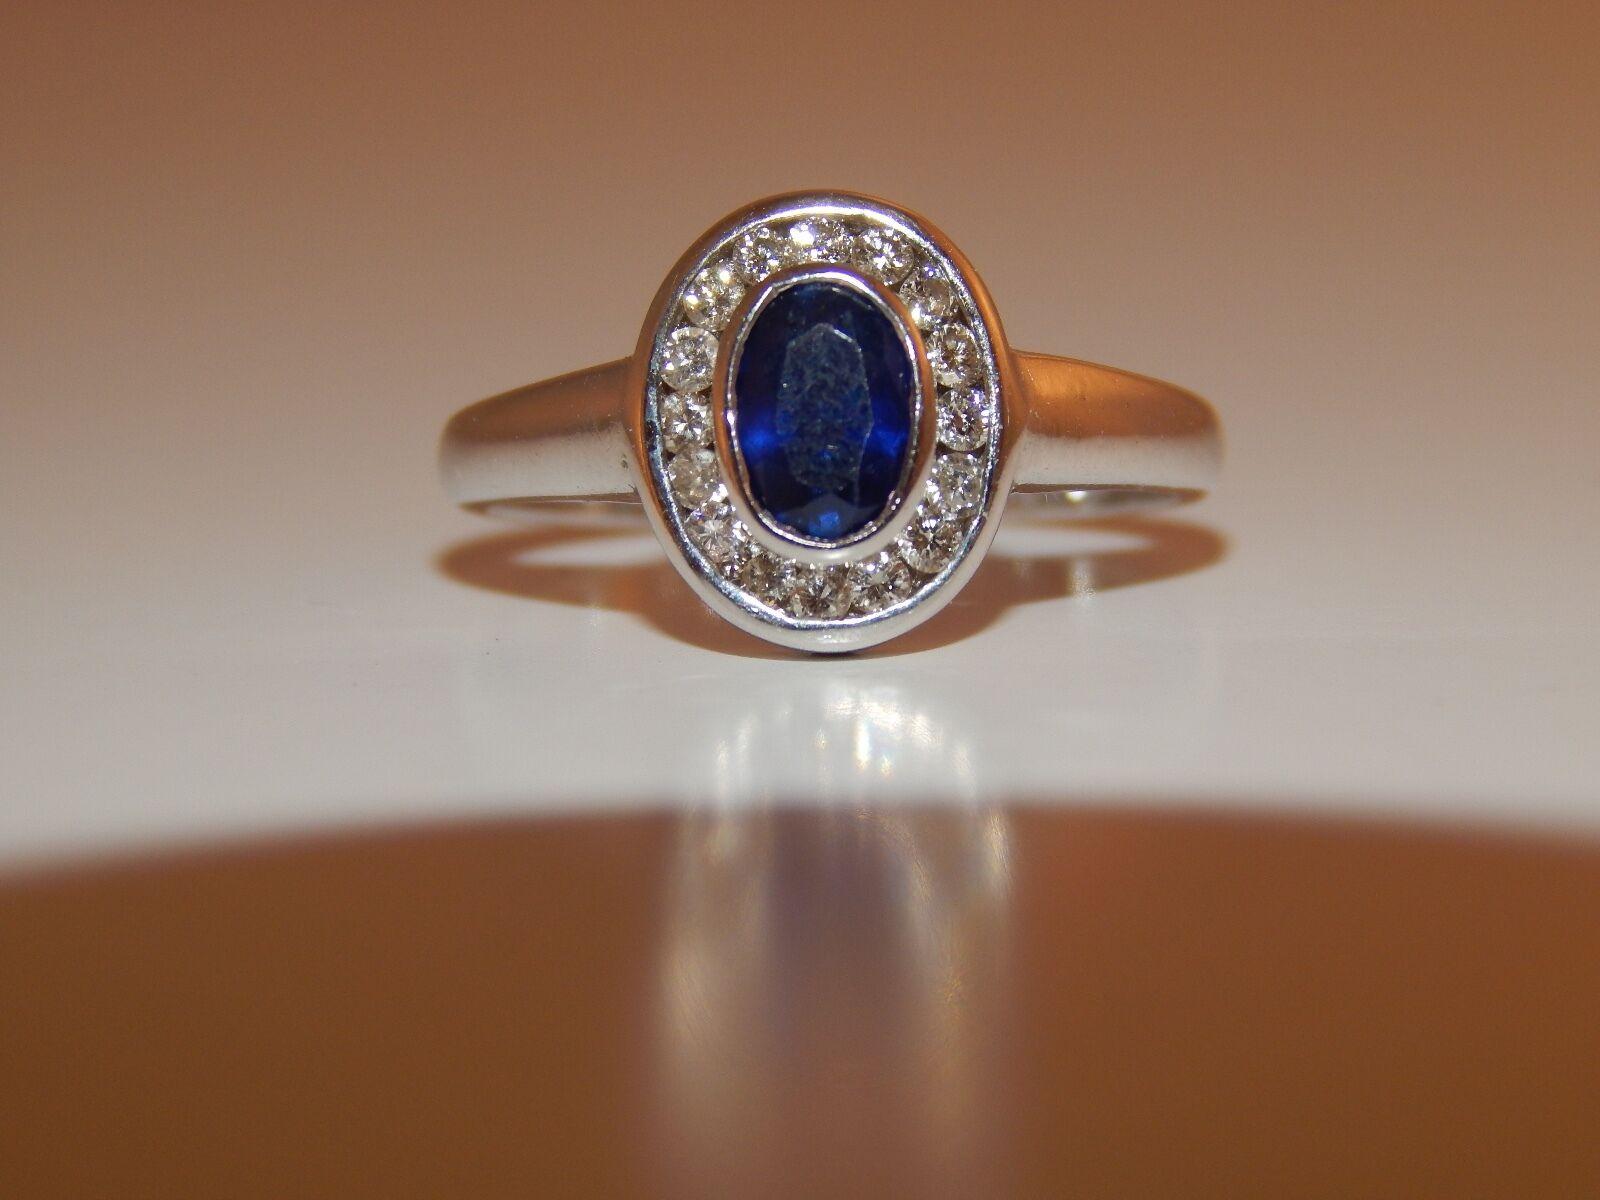 1.07 tcw High End Kashmir Sapphire & Diamond Halo Engagement Ring 14k WG I VS2